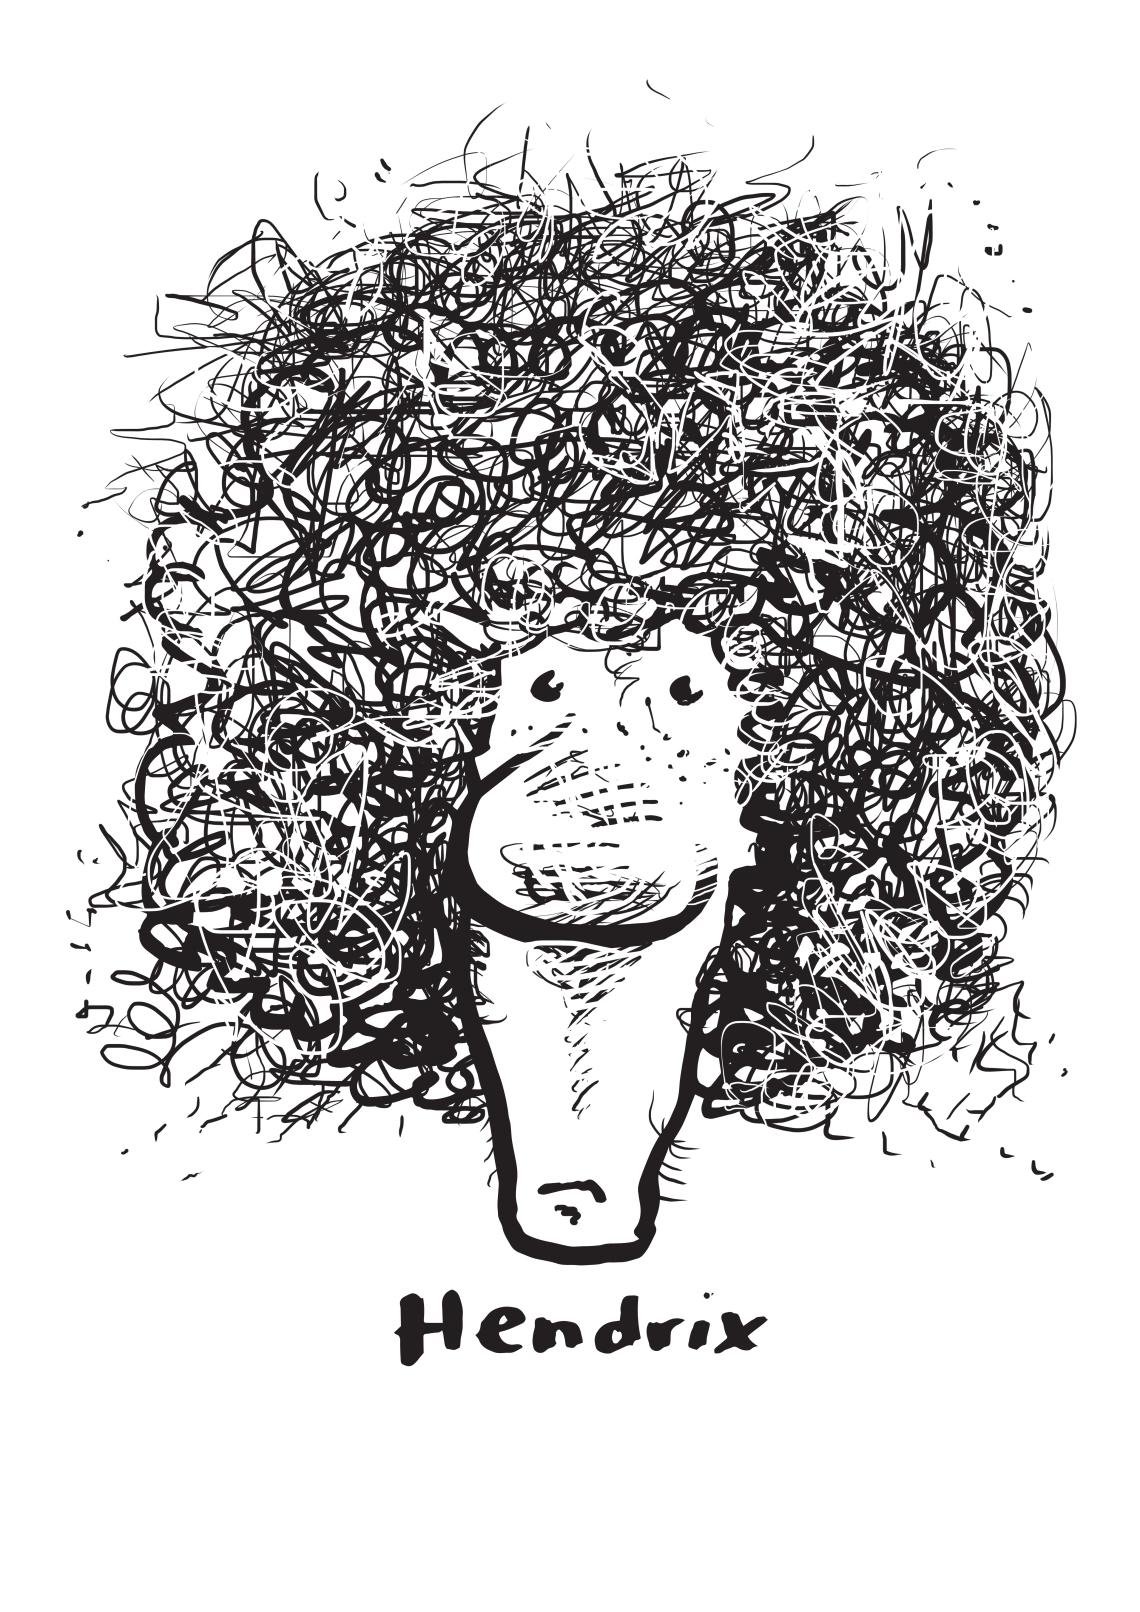 Haircuthendrix